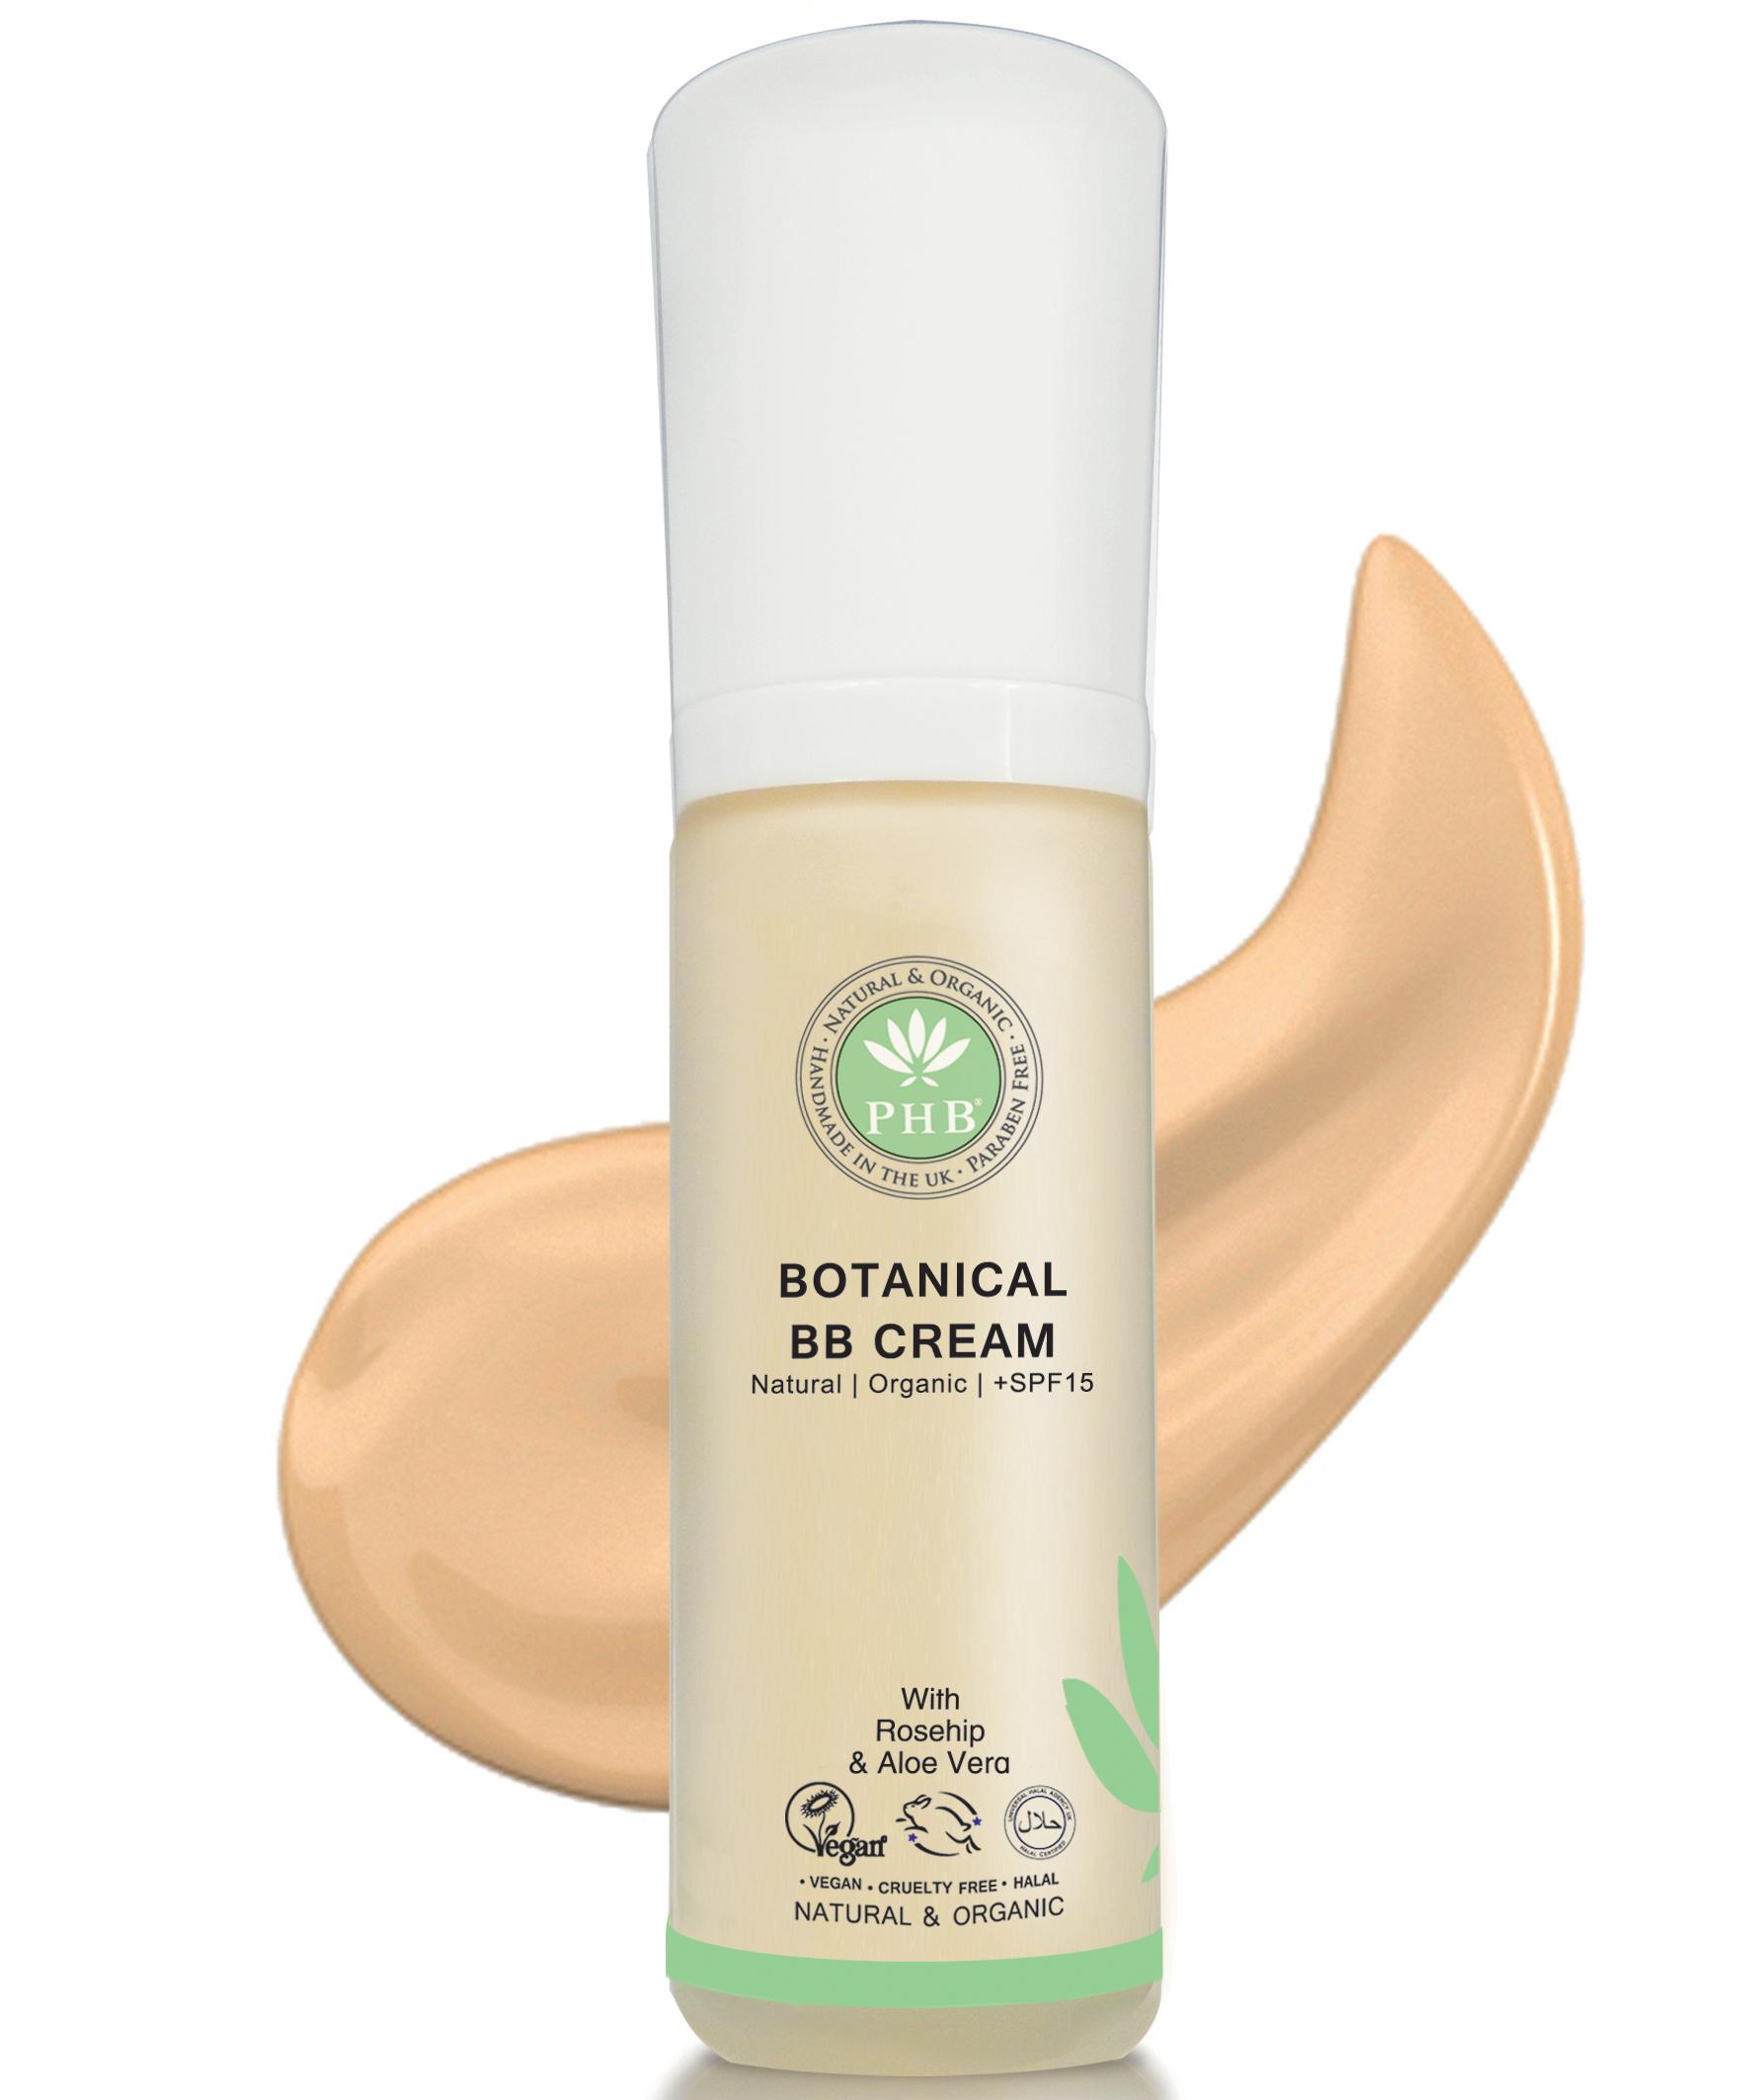 Phb Botanical Bb Cream Spf 15 Vegan Cruelty Free Halal Mineral Botanica All In One Aloe Vera For Skin Types Great Sensitive Acne Size 30g